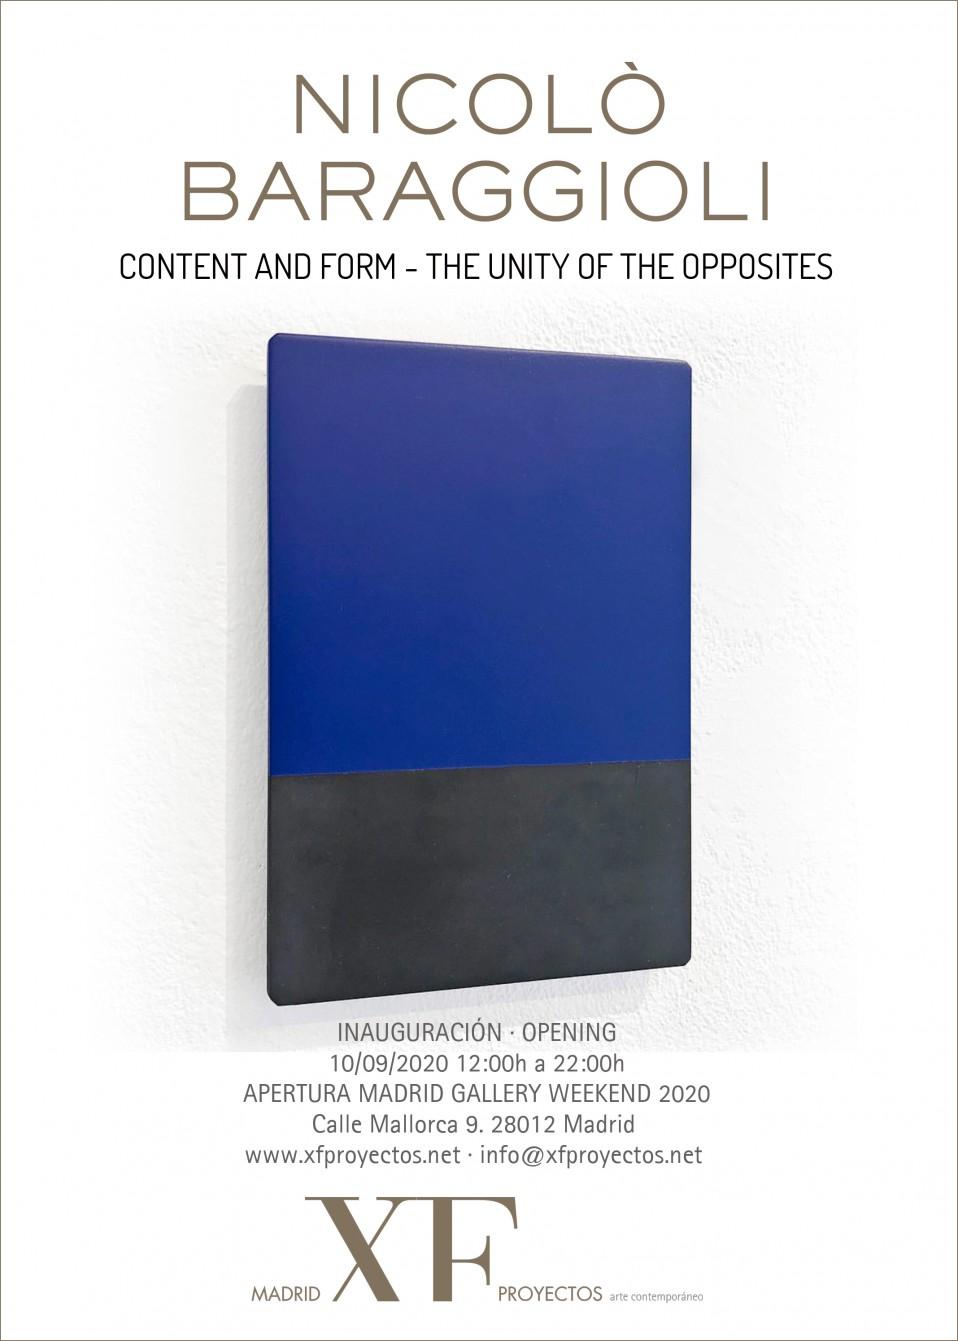 "Madrid XF Proyectos. Próxima exposición: NICOLÒ BARAGGIOLI ""Content and form – The unity of the opposites"". Inauguración 10/09/2020. 12h a 22h."